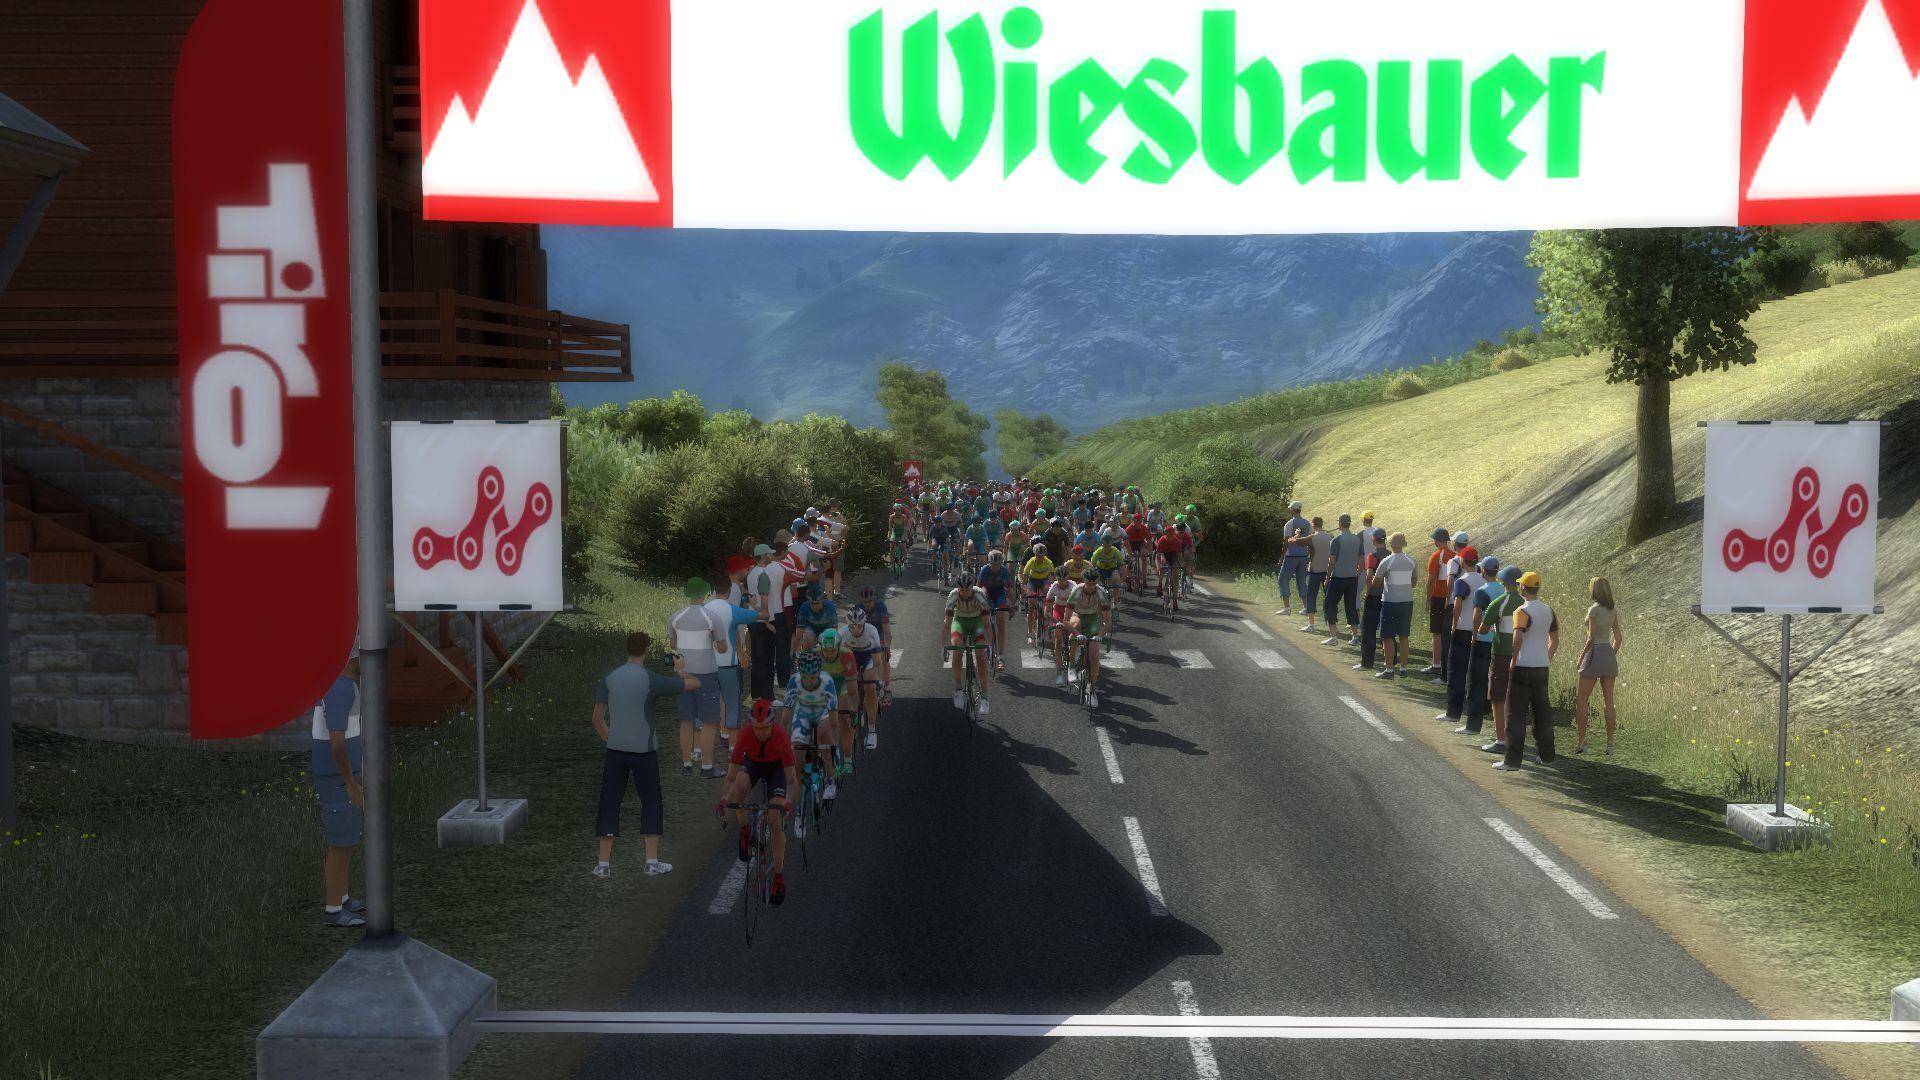 pcmdaily.com/images/mg/2020/Reports/HC/Austria/S4/mg20_austria_s04_14.jpg